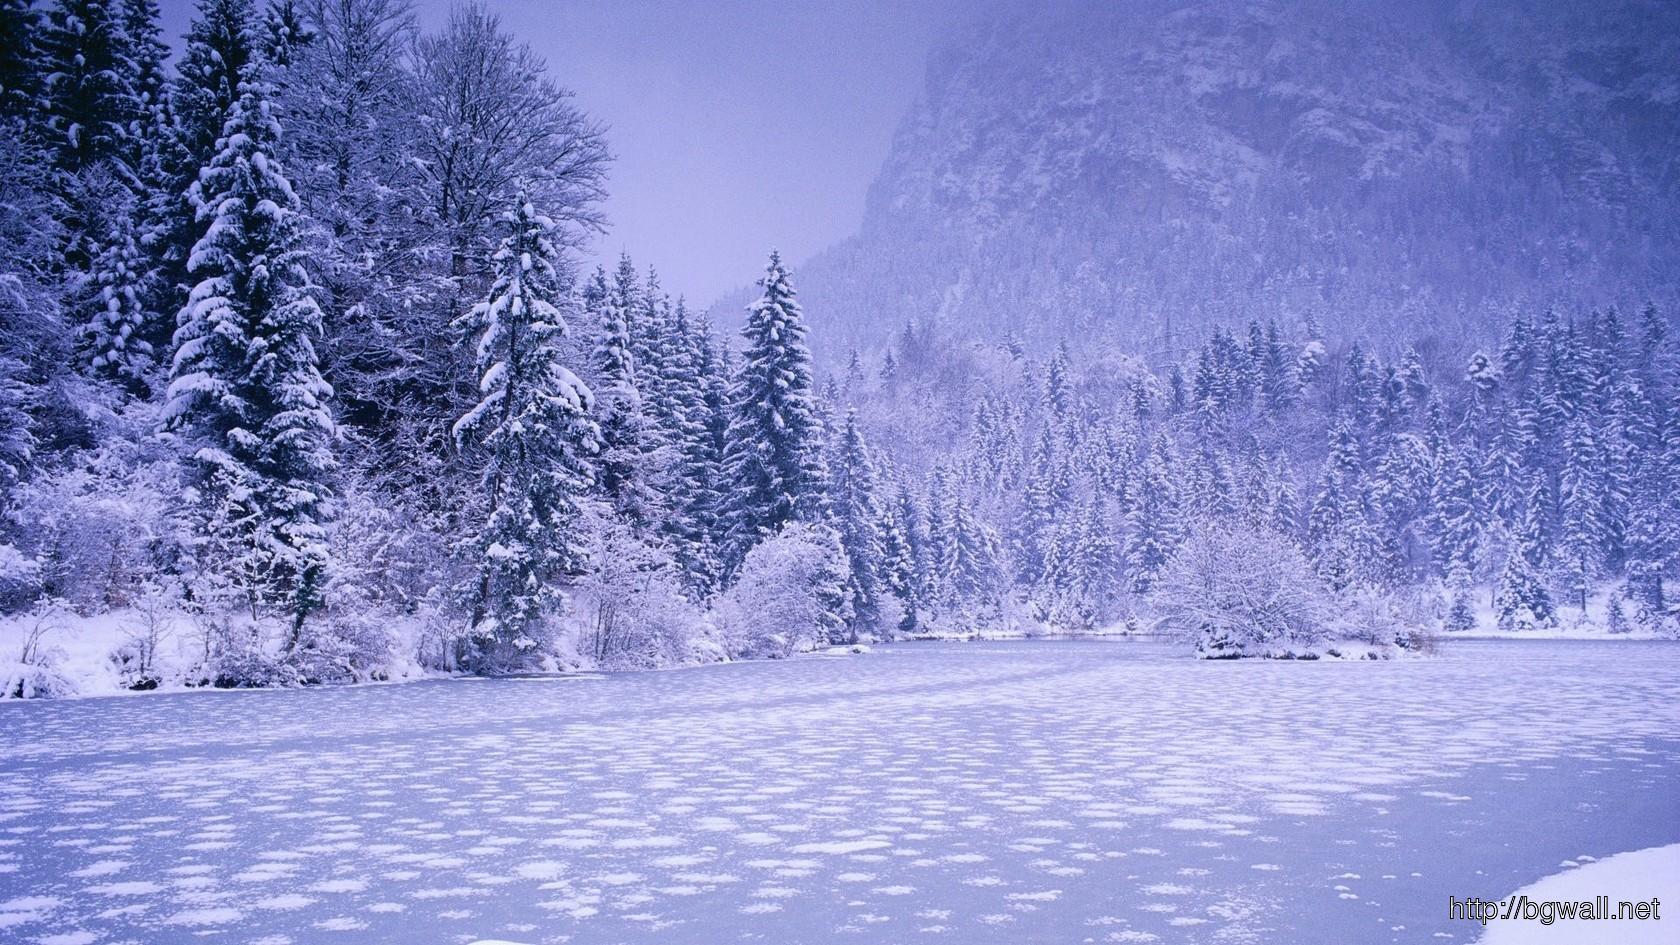 Frozen River Wallpaper 6031 Full Size